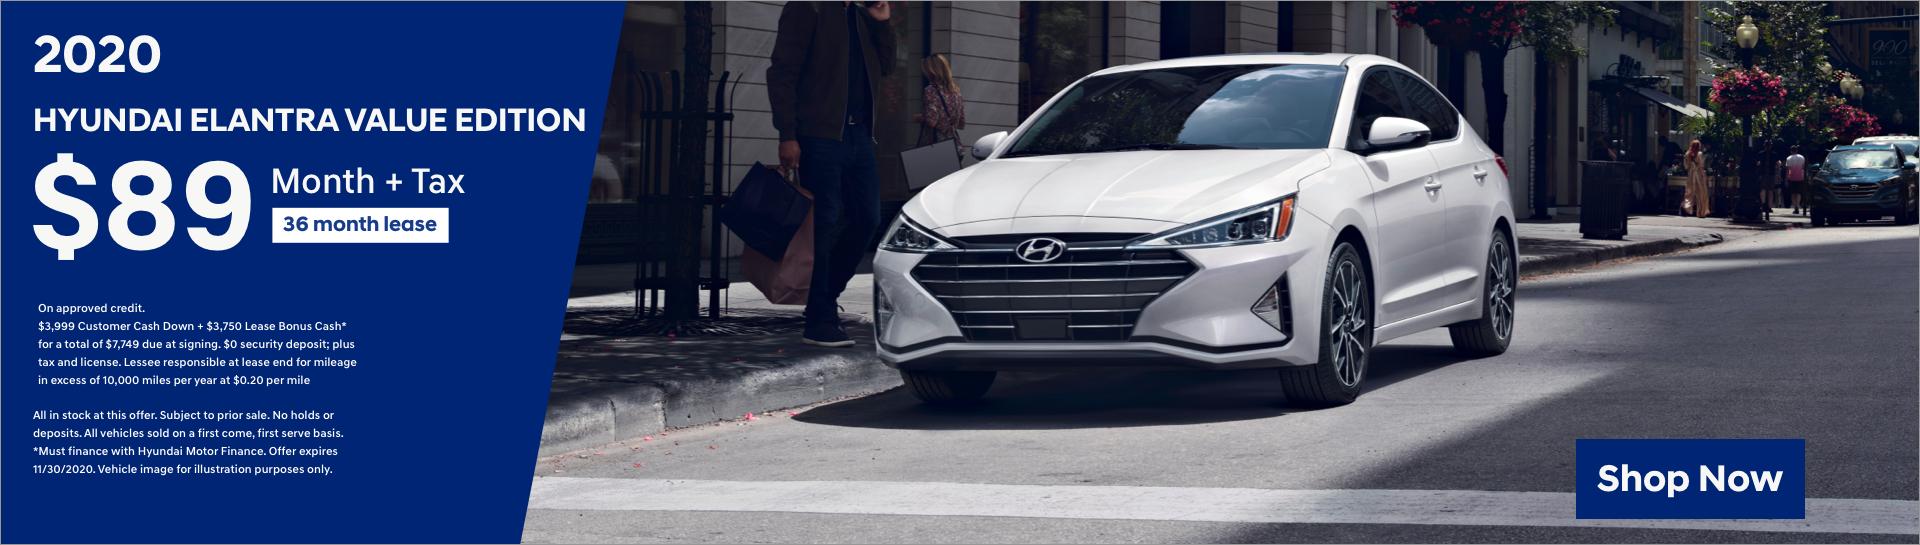 2020 Hyundai Elantra Lease